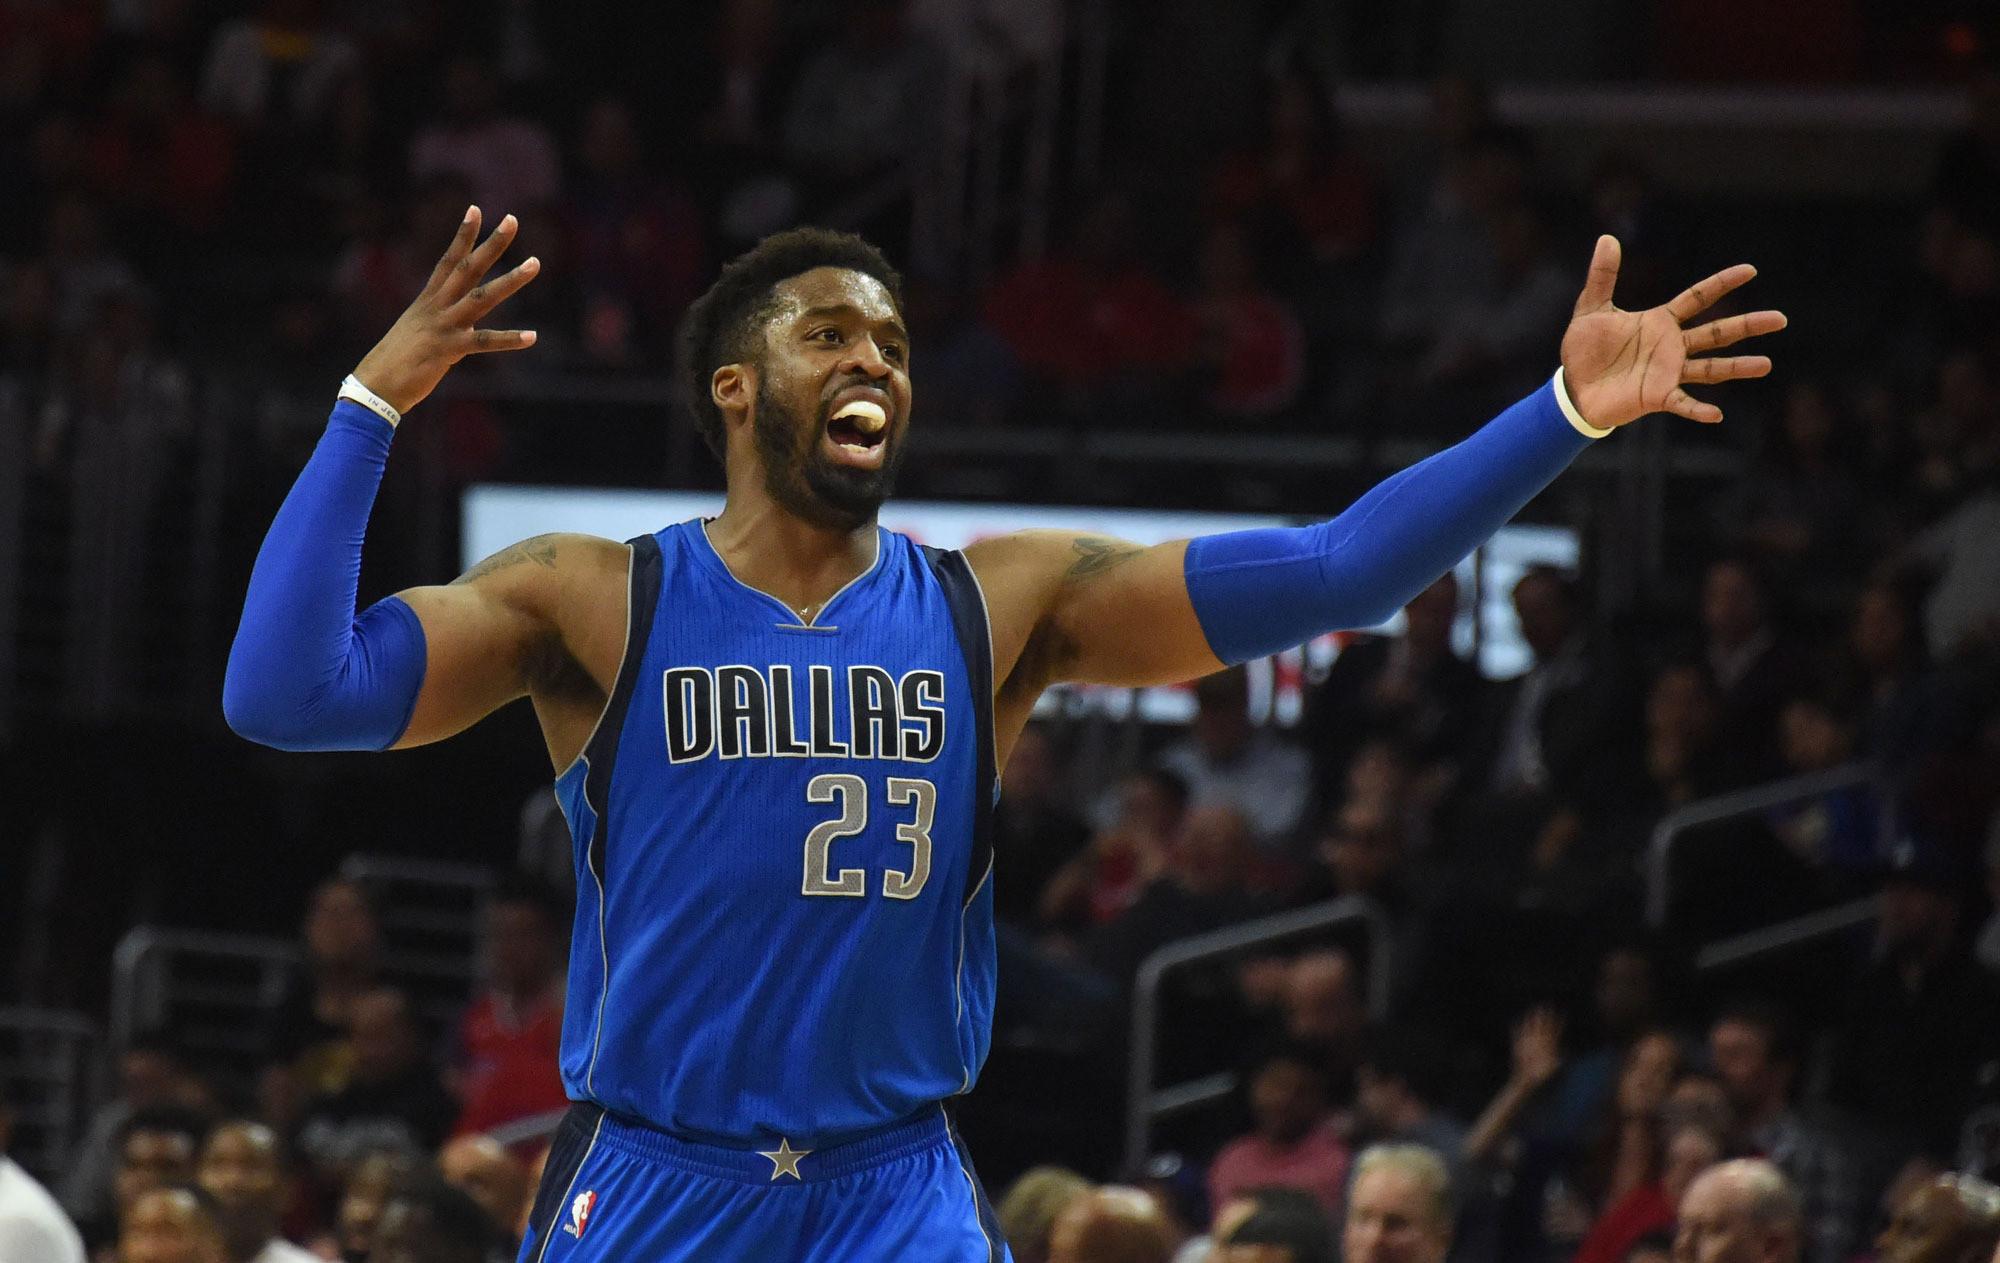 A way-too-early look at the massive 2018 NBA free agent class |  Yardbarker.com